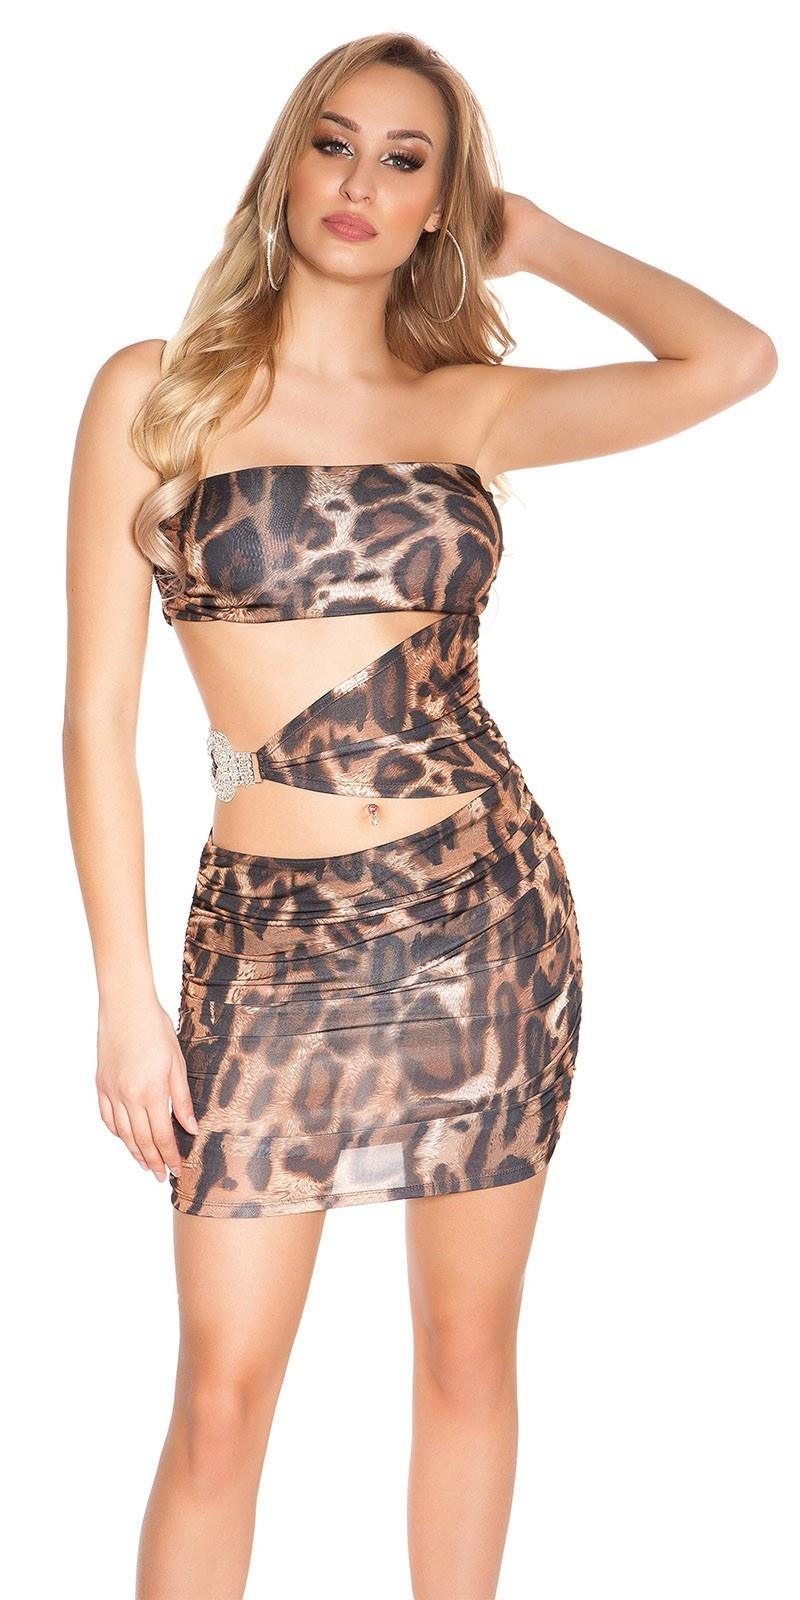 Sexy feest uitgaans jurk met strass steentjes strik luipaard